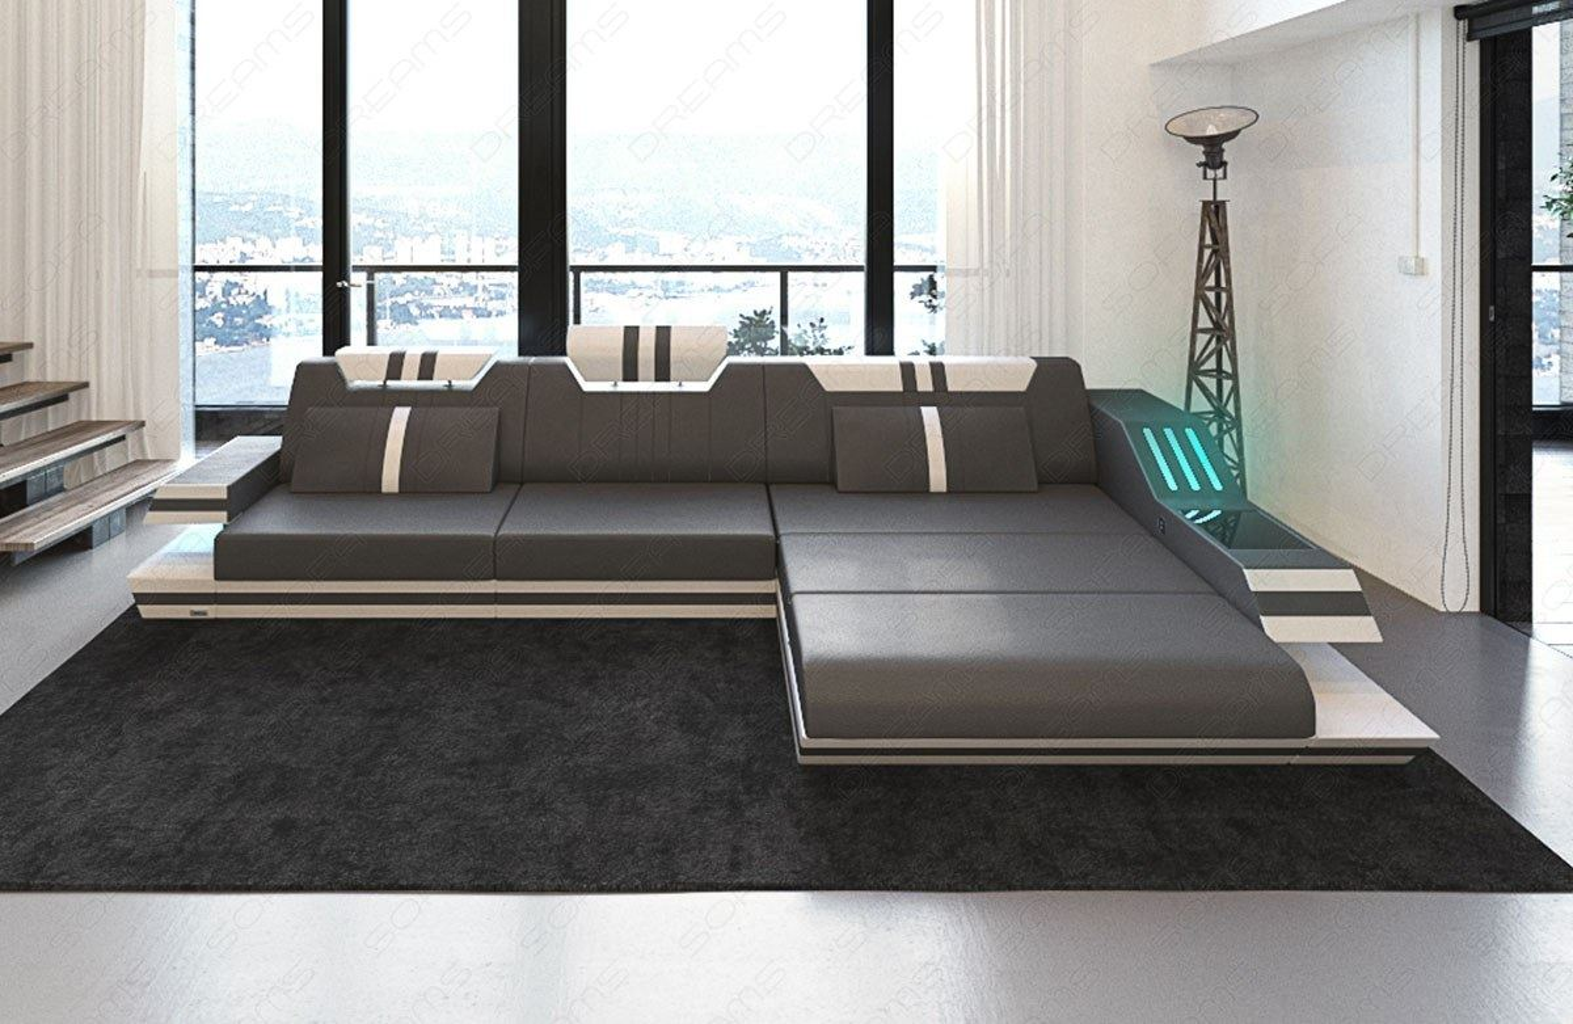 eckcouch ledersofa ravenna l form designsofa mit led beleuchtung usb grau weiss ebay. Black Bedroom Furniture Sets. Home Design Ideas